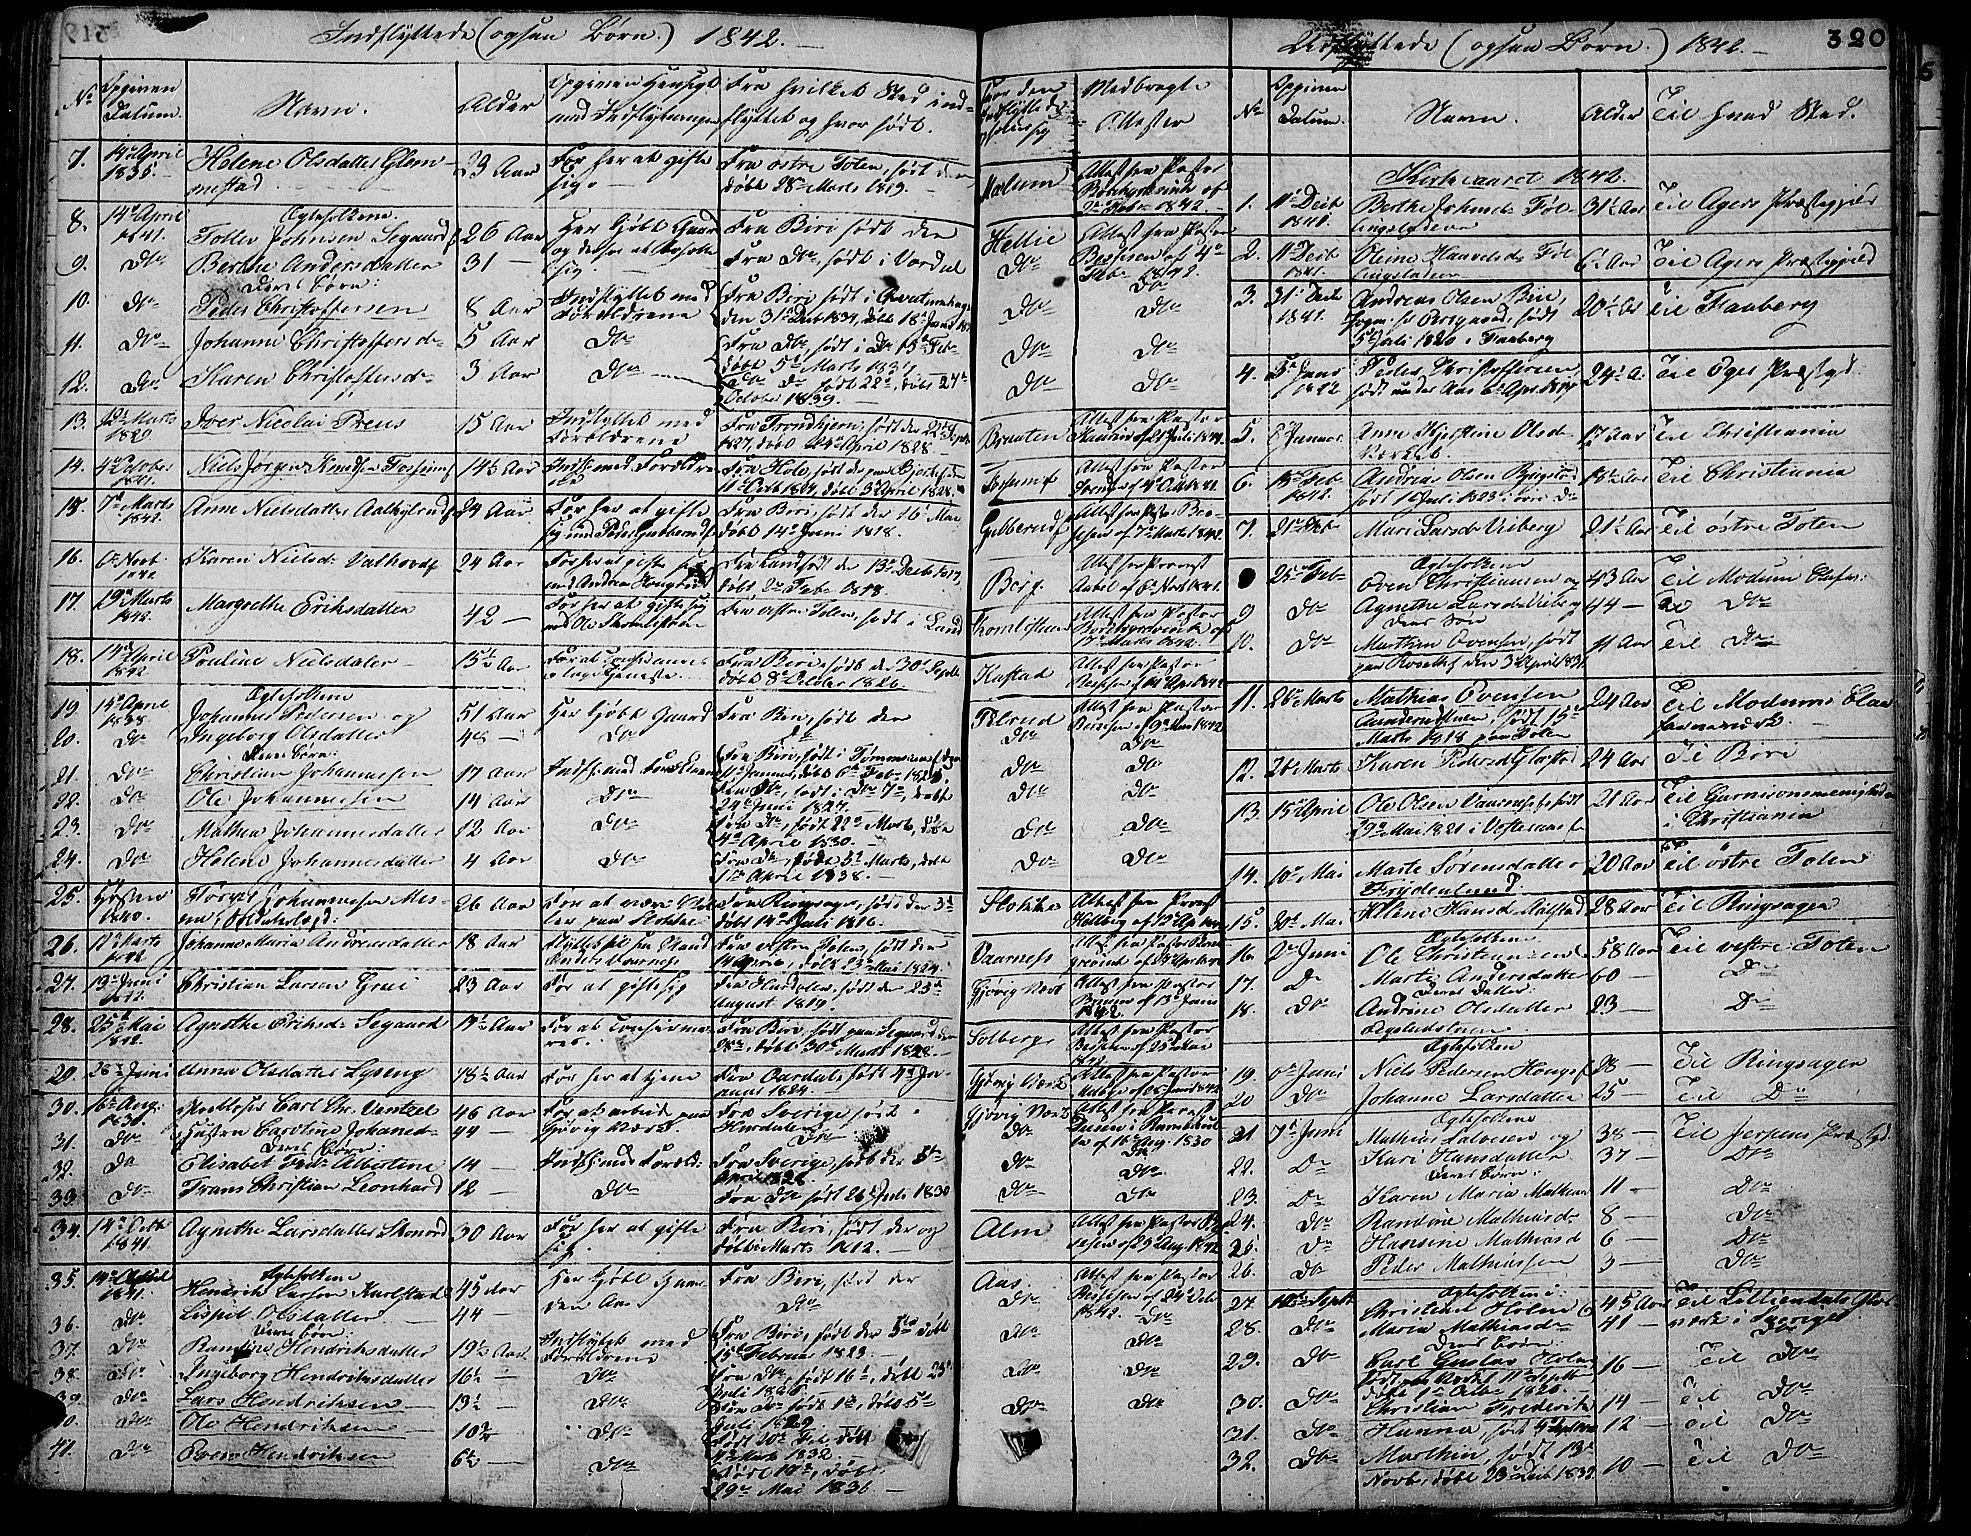 SAH, Vardal prestekontor, H/Ha/Hab/L0004: Klokkerbok nr. 4, 1831-1853, s. 320